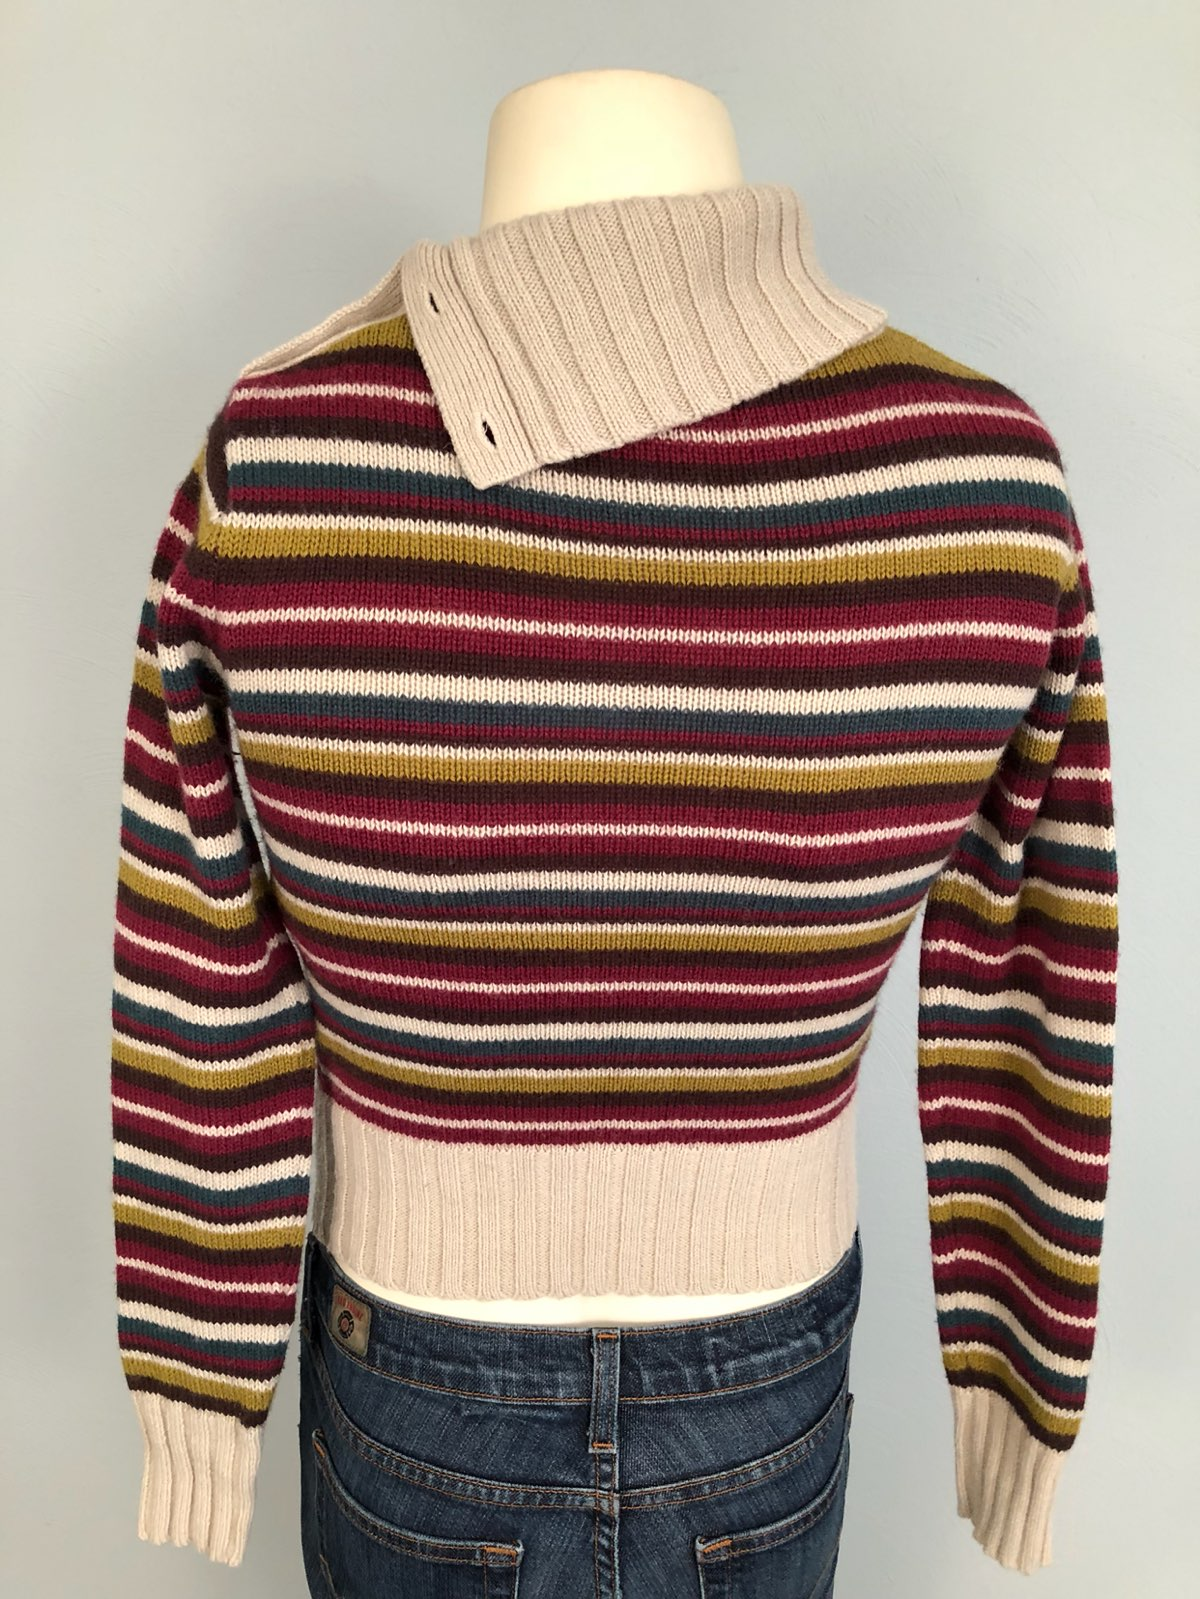 Zara Wool/Cotton Cowl Neck Sweater Small - Mercari: BUY & SELL ...